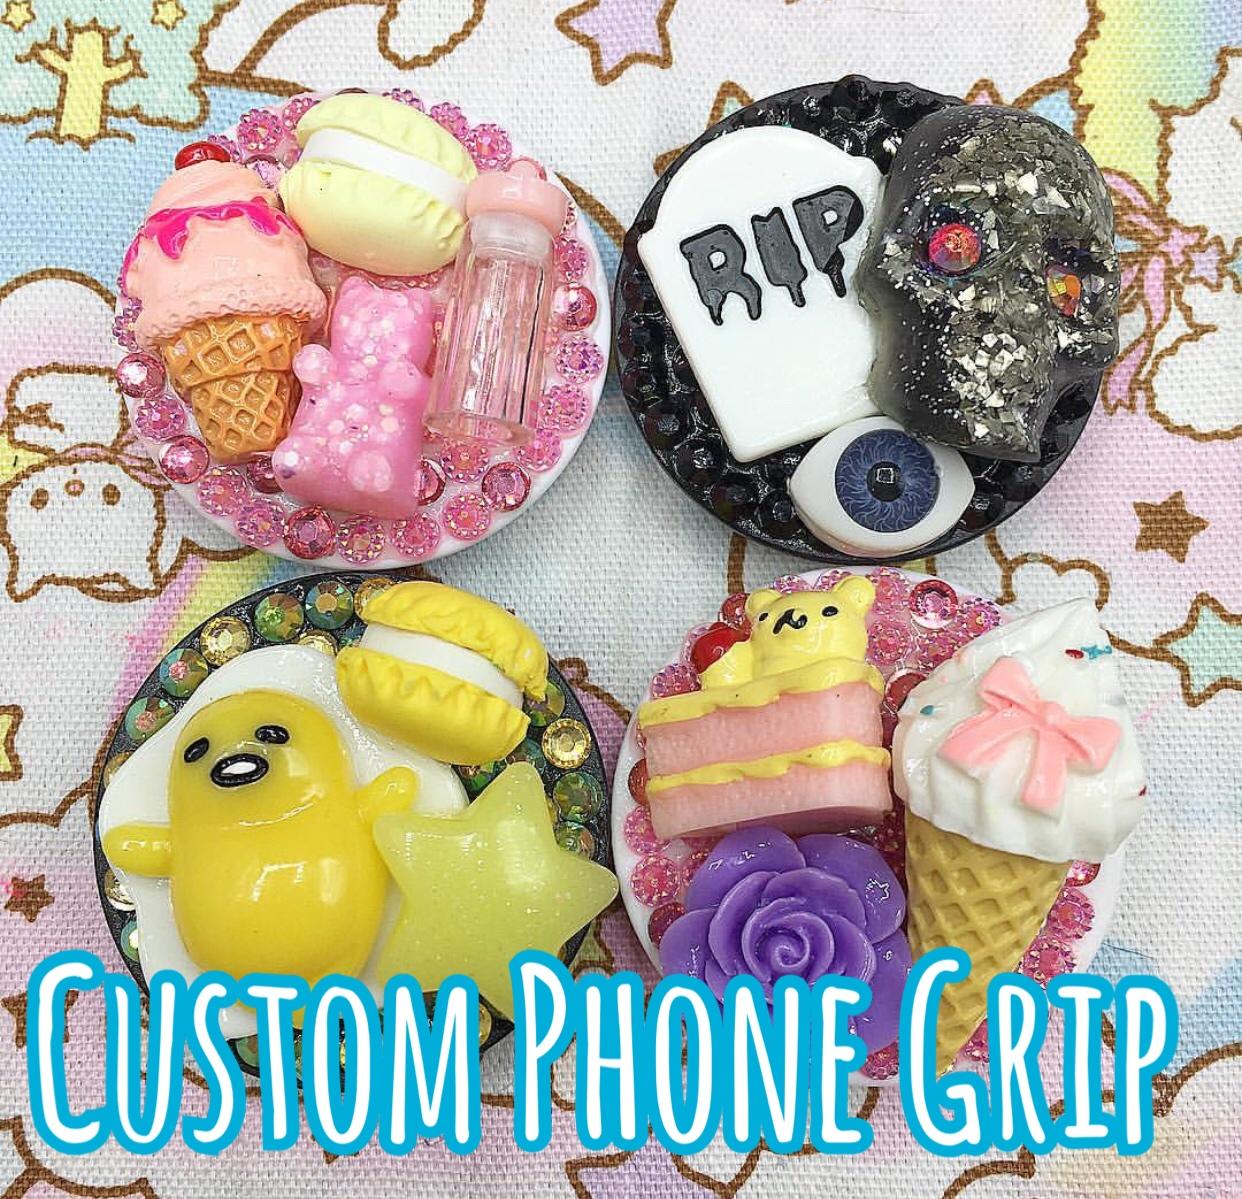 Custom Phone Grip